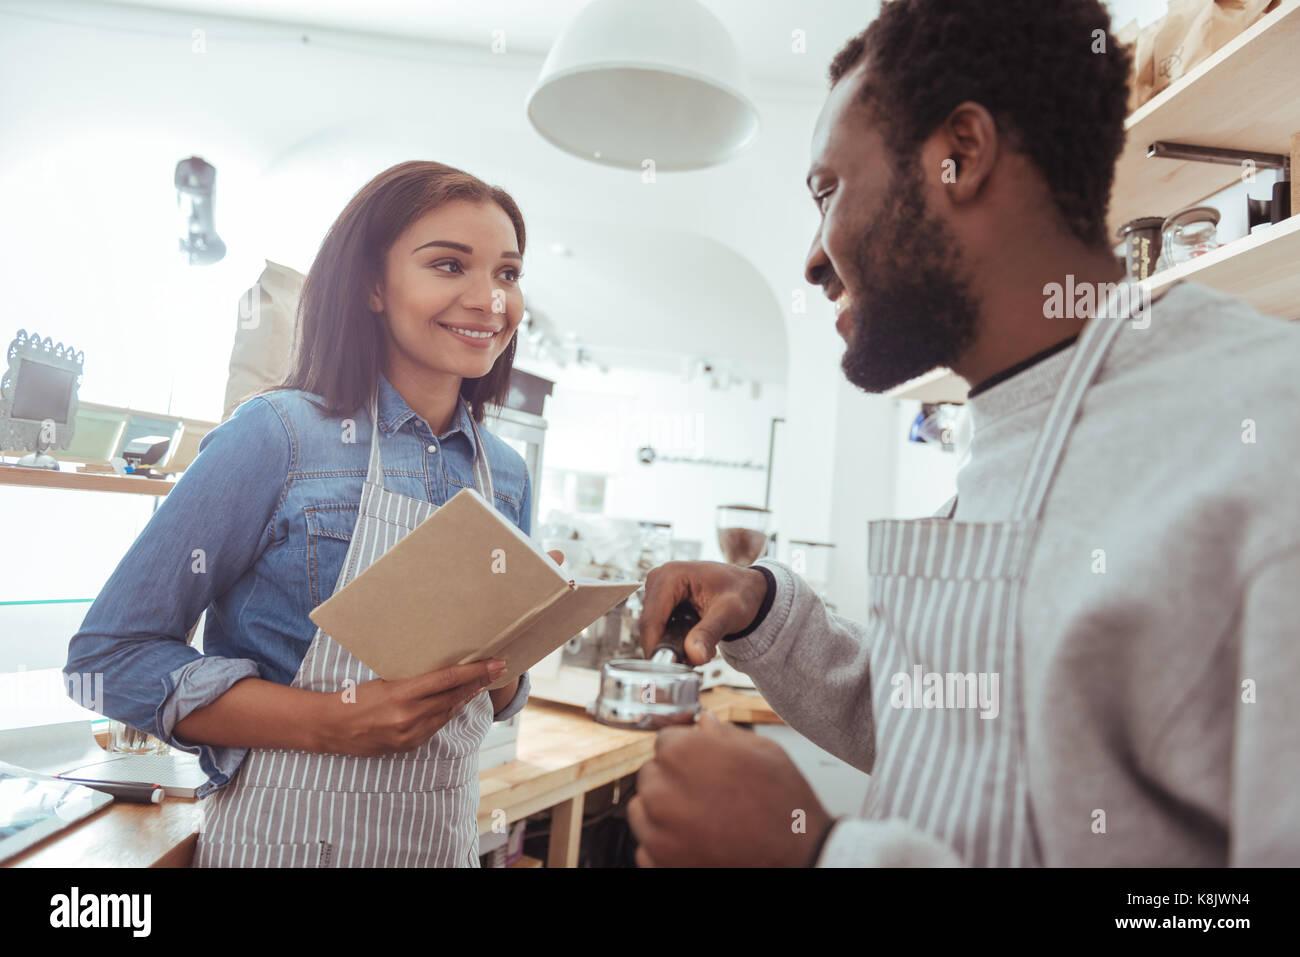 Charming barista explaining his colleague how to use portafilter - Stock Image